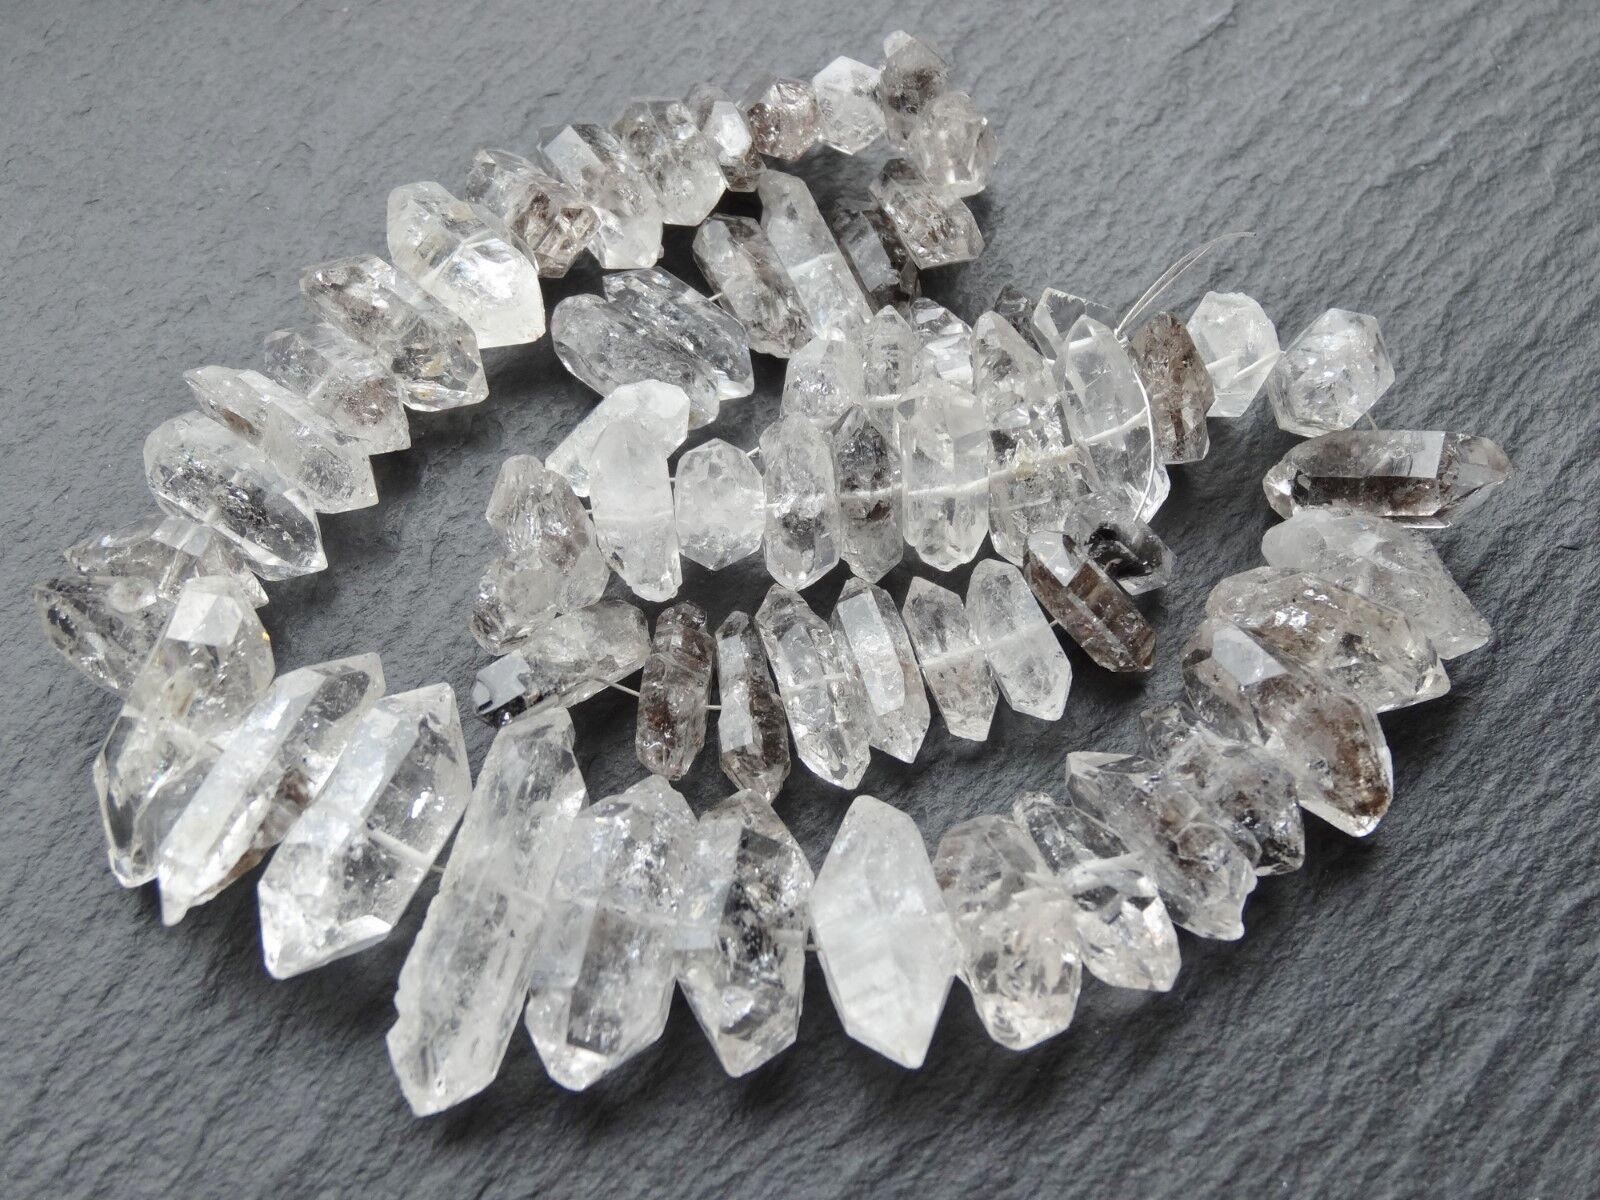 Freiform Herkimer Diamant Quartz 6x14mm - 10x32mm 40.6cm Strang 63 Perlen